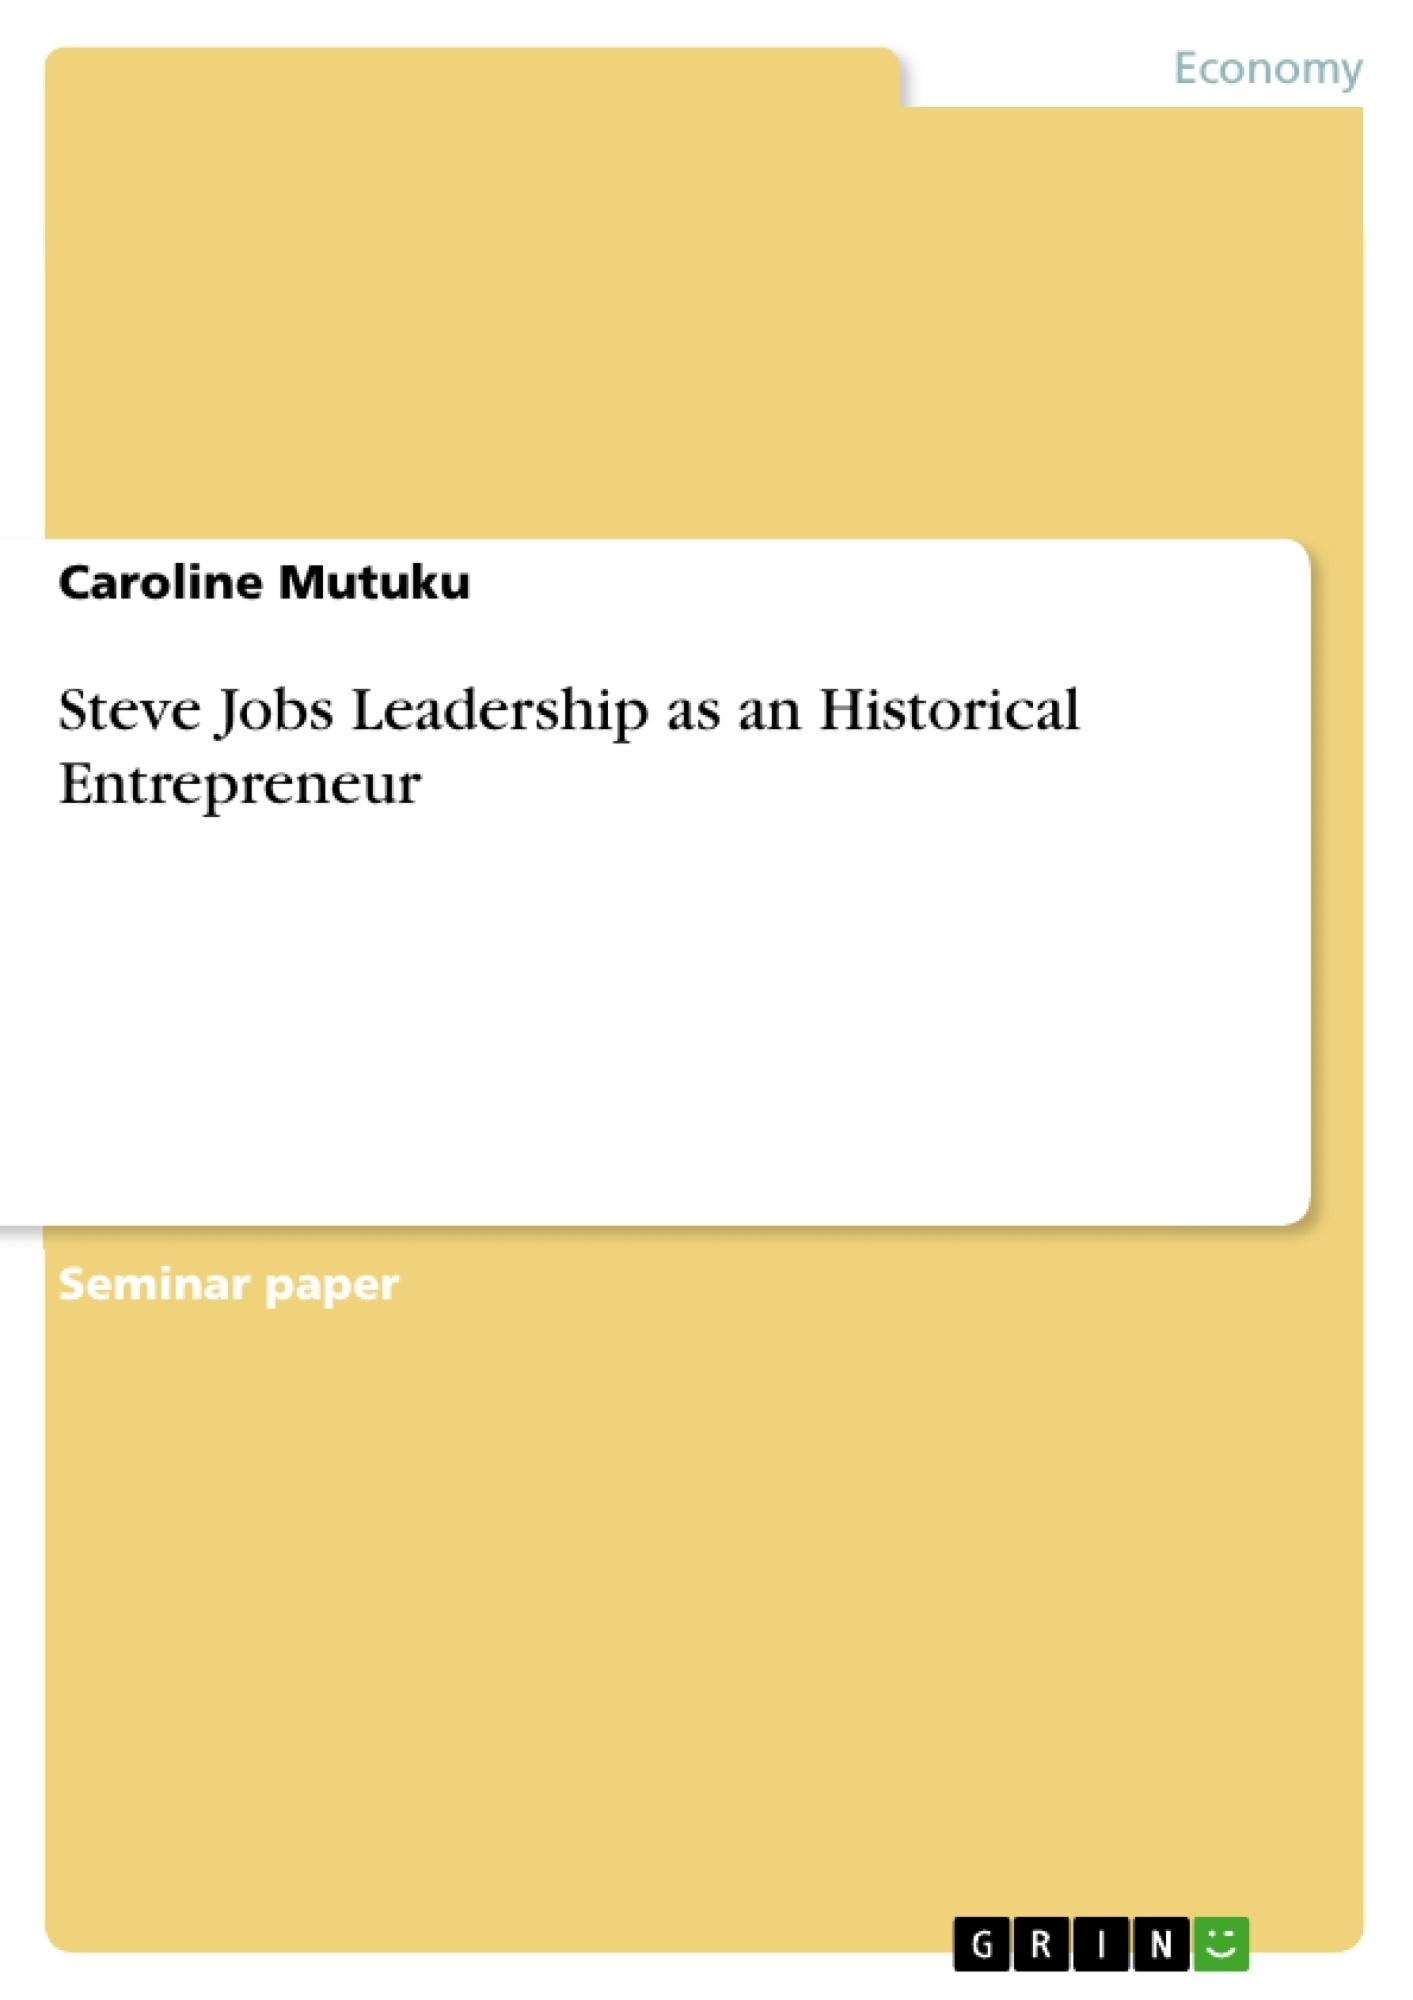 Title: Steve Jobs Leadership as an Historical Entrepreneur